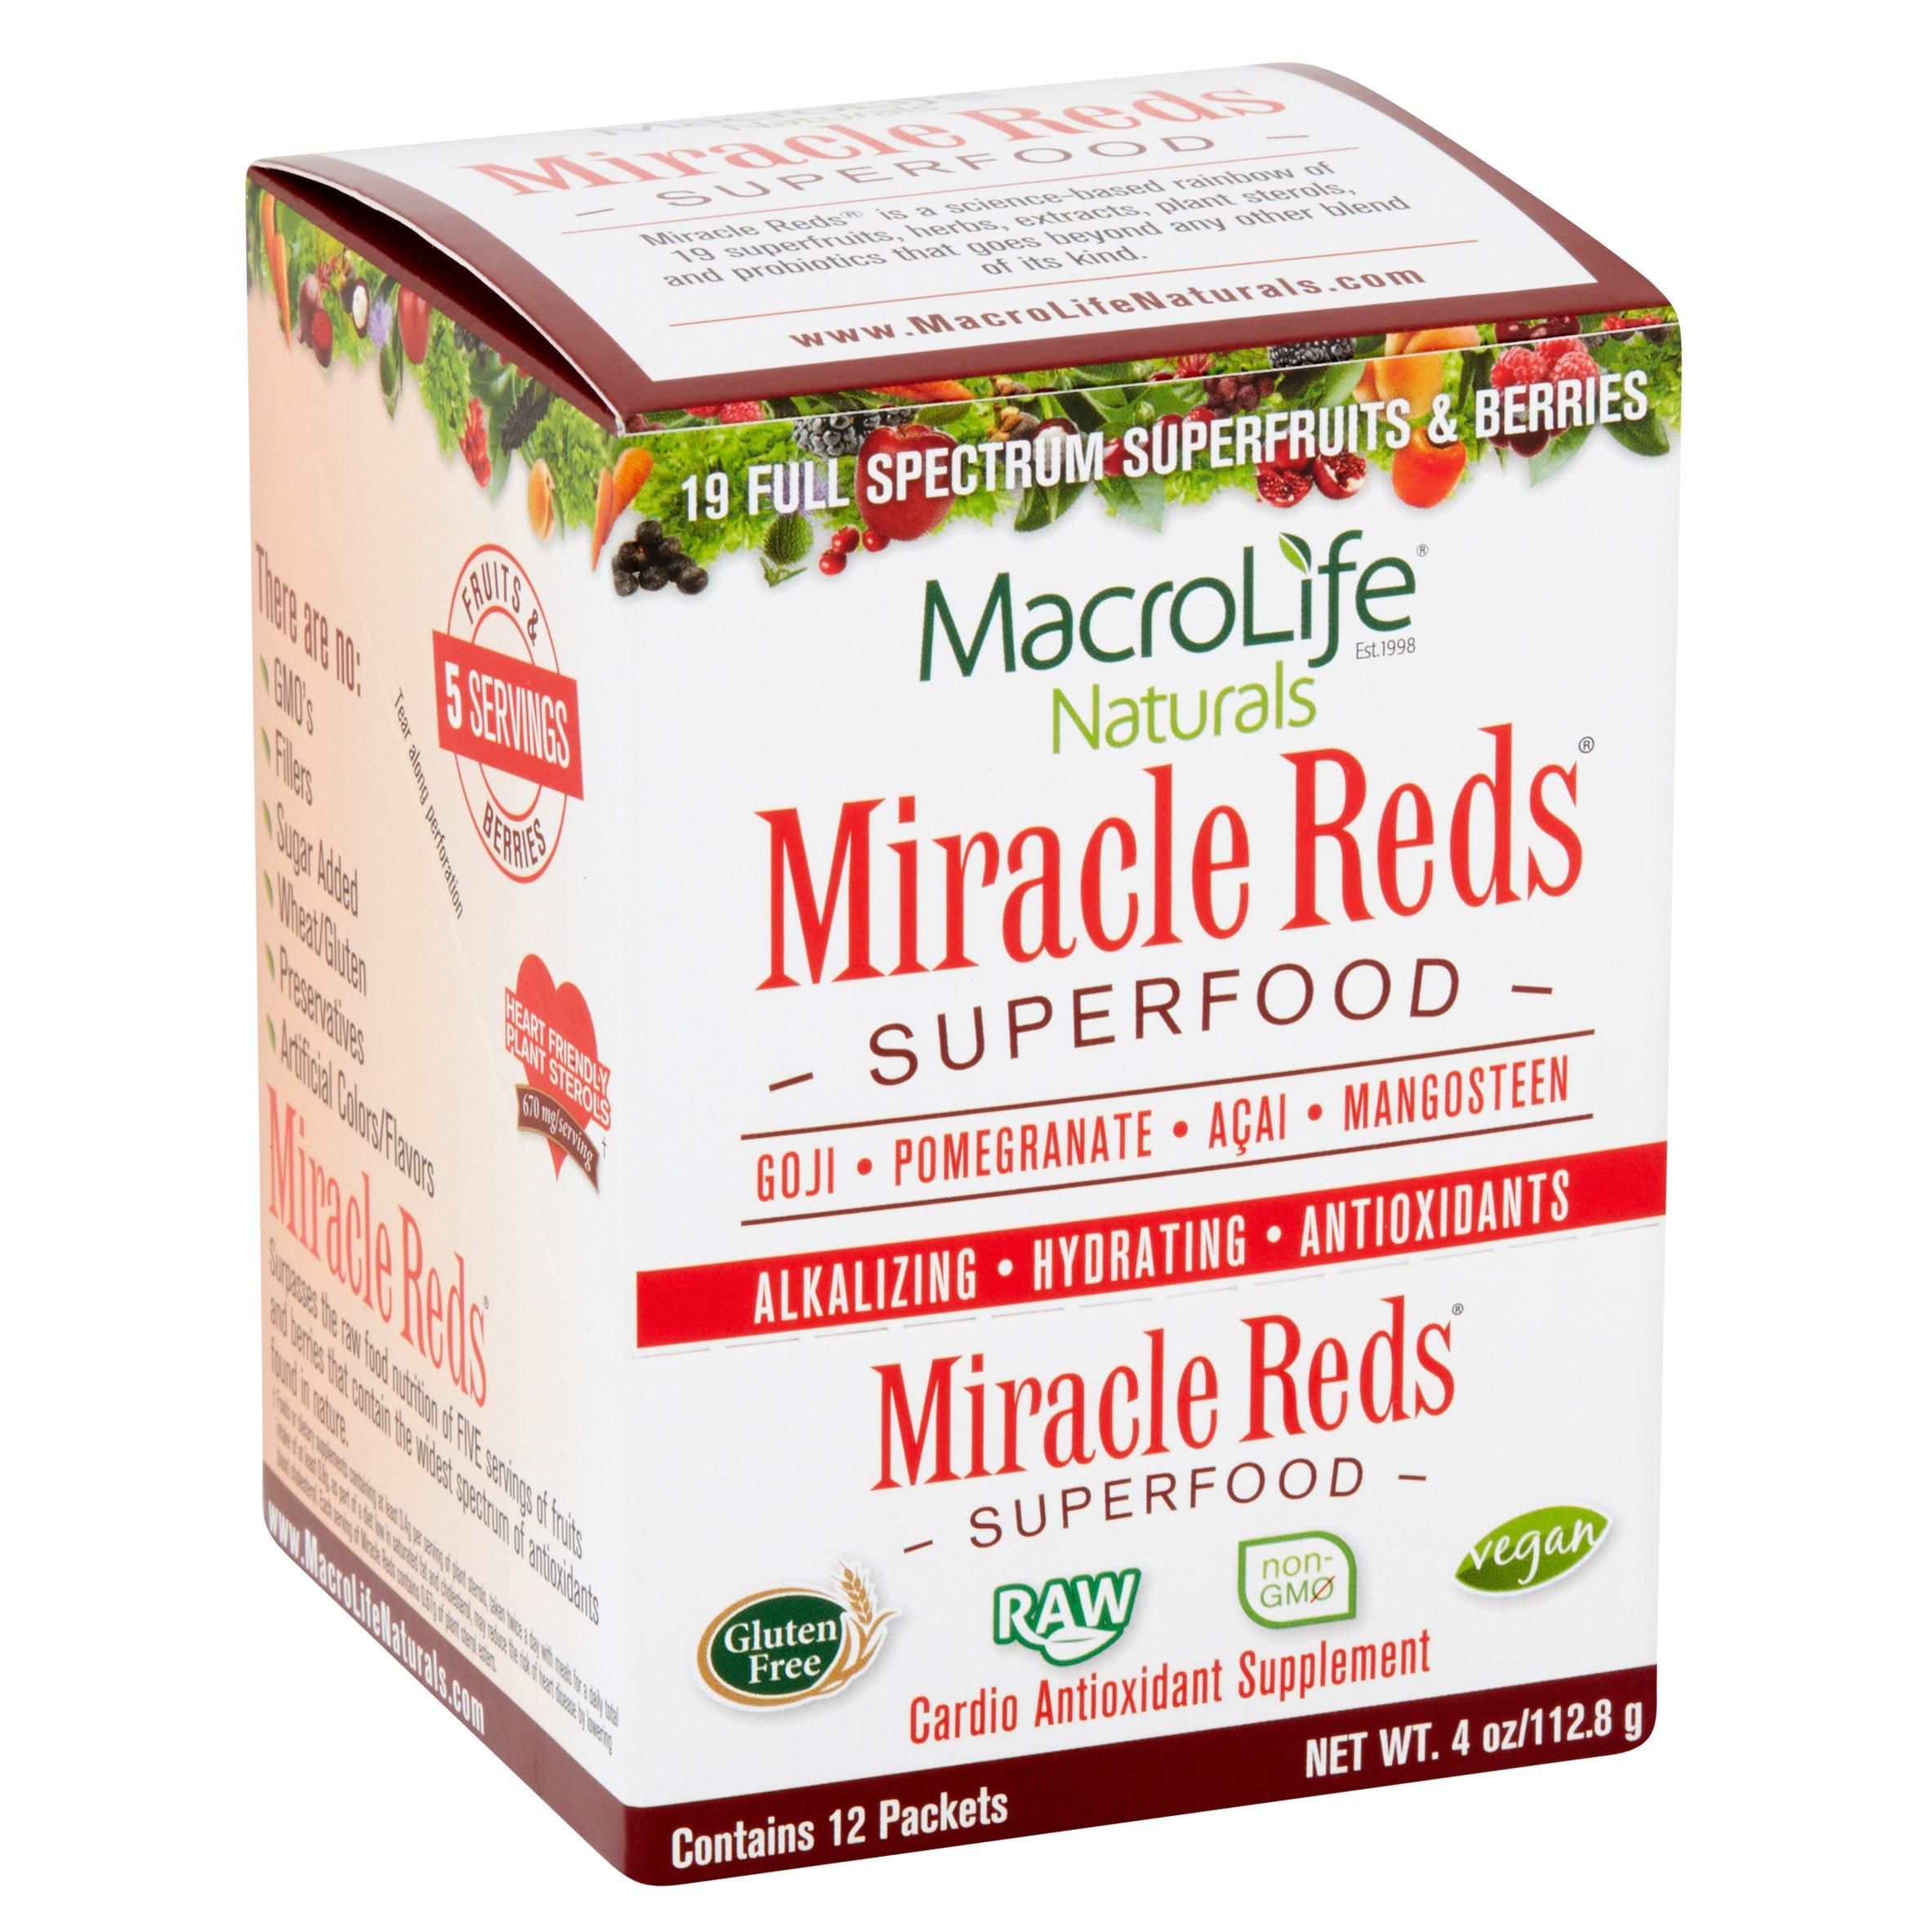 MacroLife Naturals Miracle Reds Superfood Powder, 4.0 Oz, 12 Ct